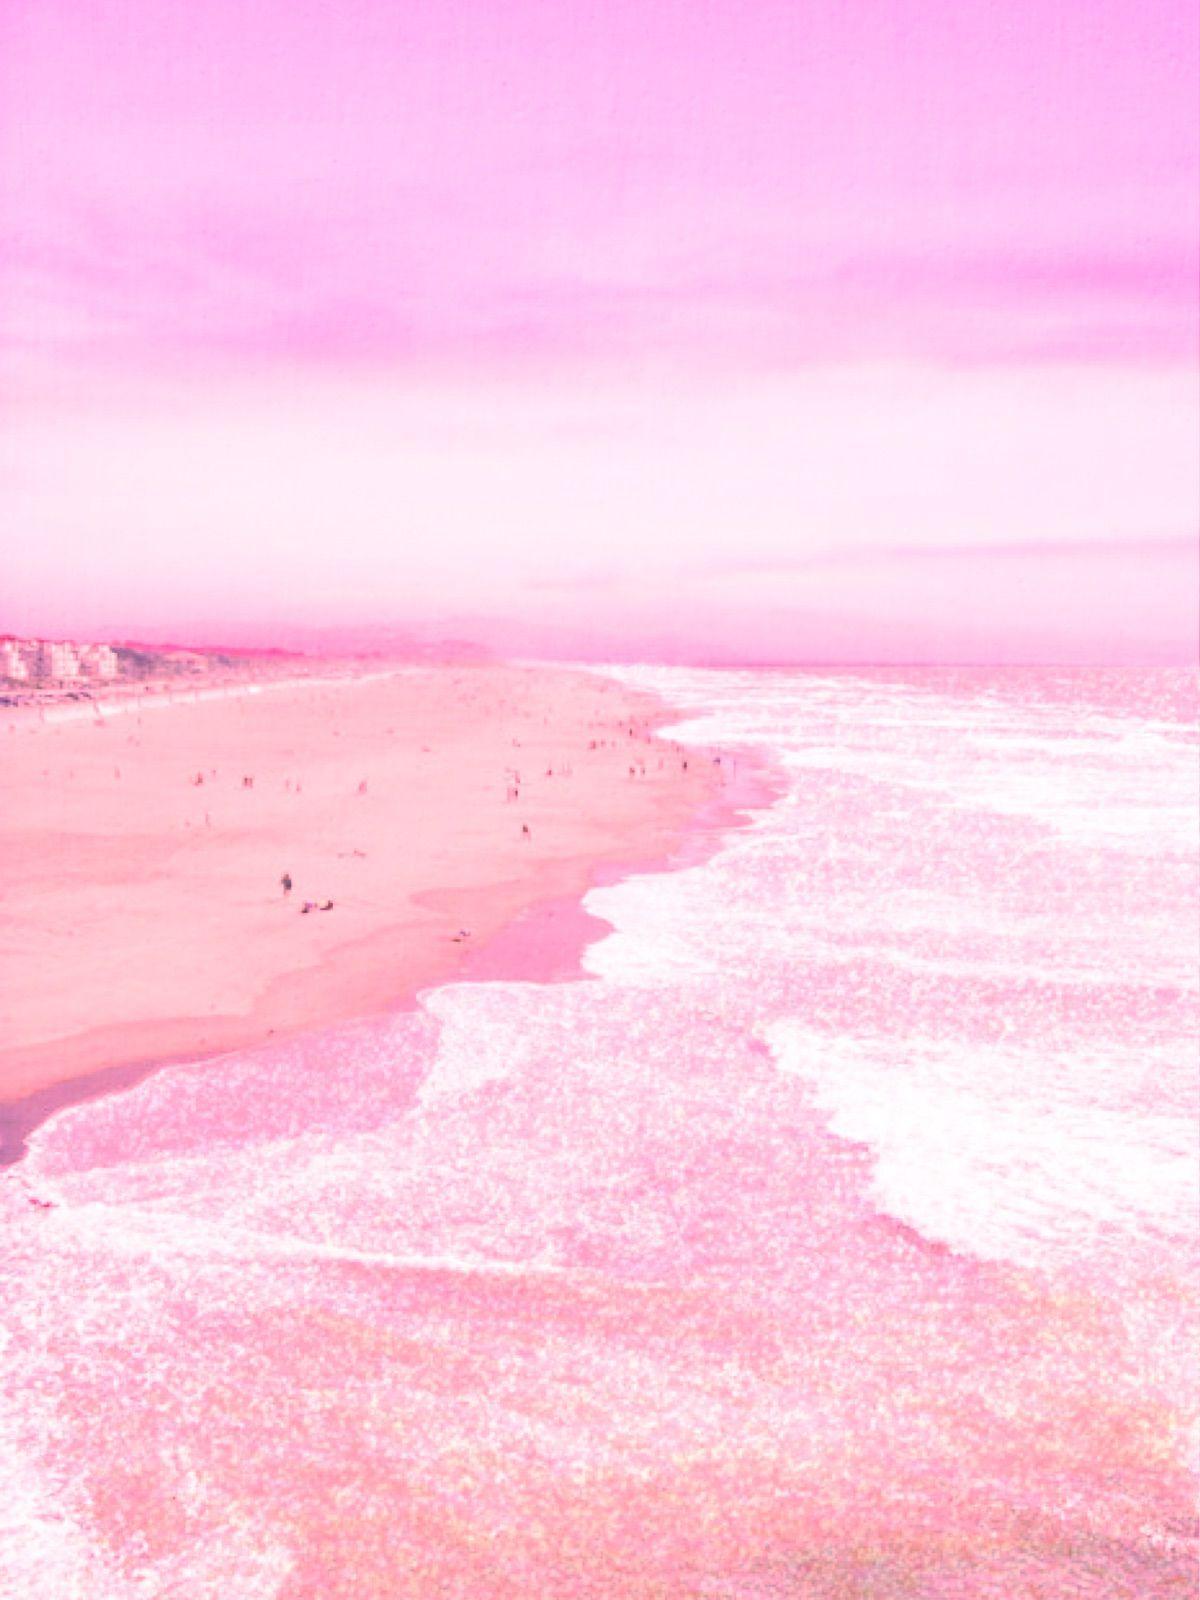 Pink Ocean Scene Wallpaper Pink And Blue Phone Wallpaper Pink Pink Aesthetic